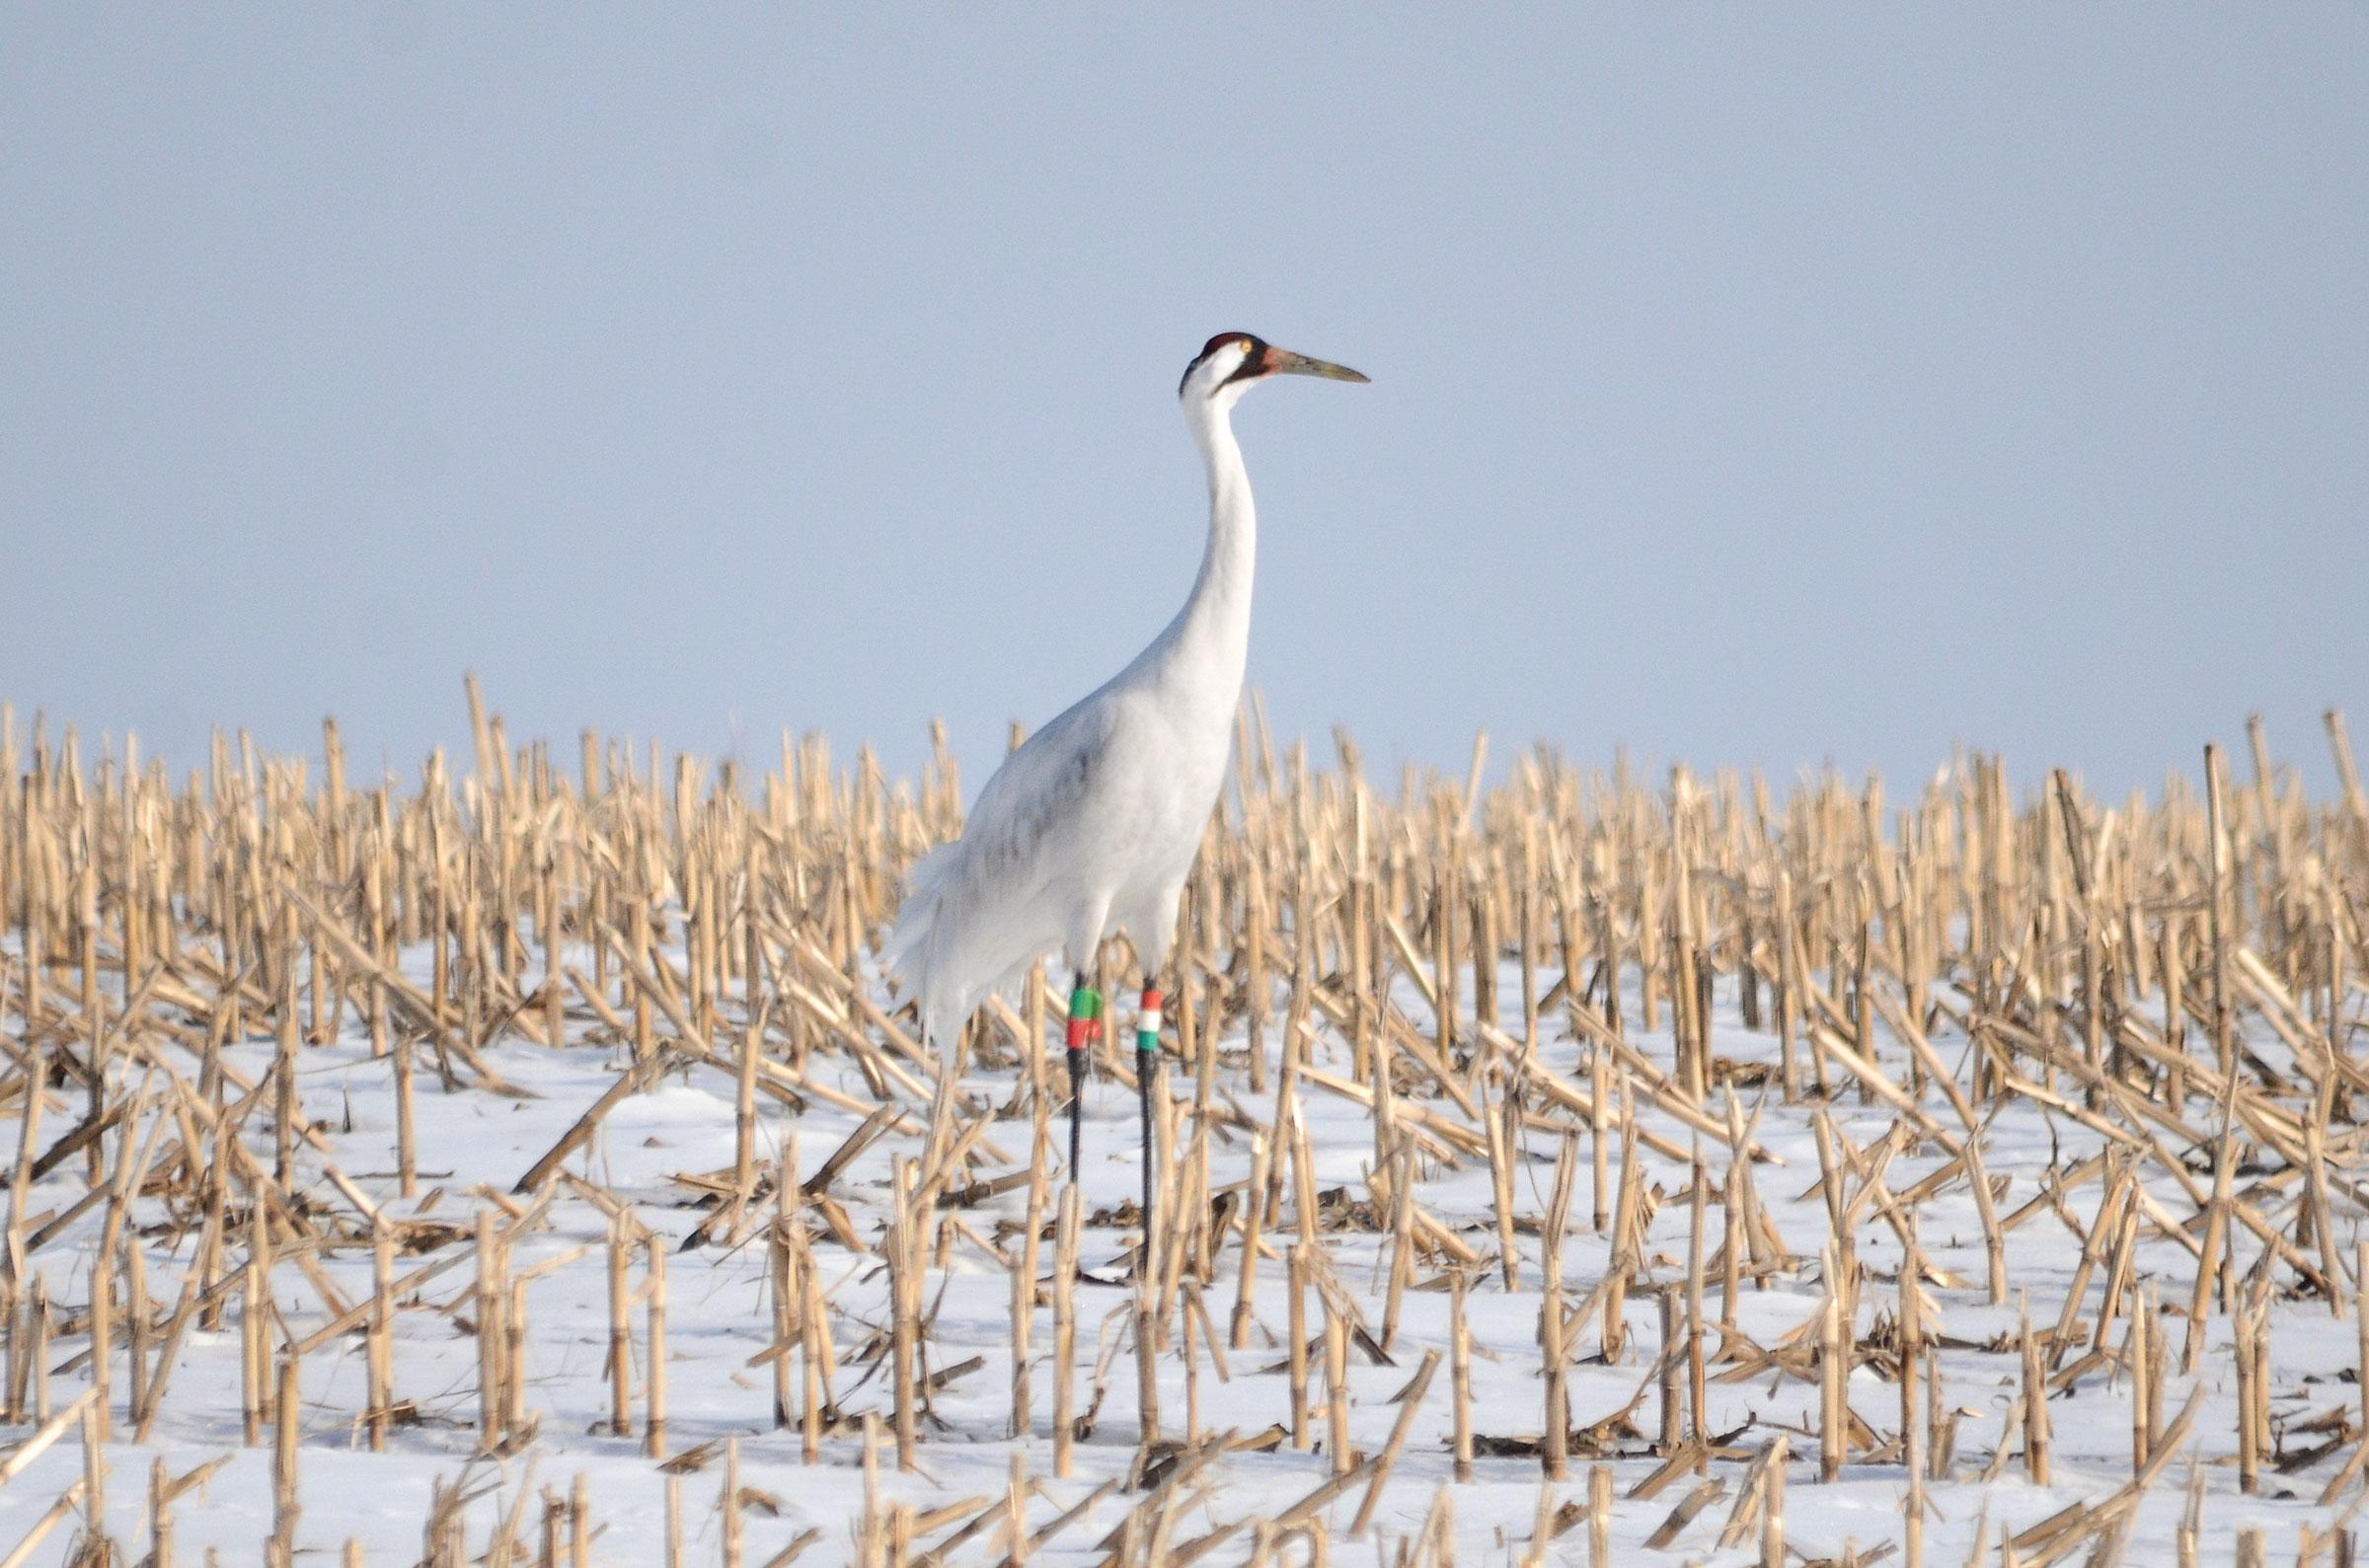 16-11 on the crane's breeding grounds in Wisconsin. Doug Pellerin